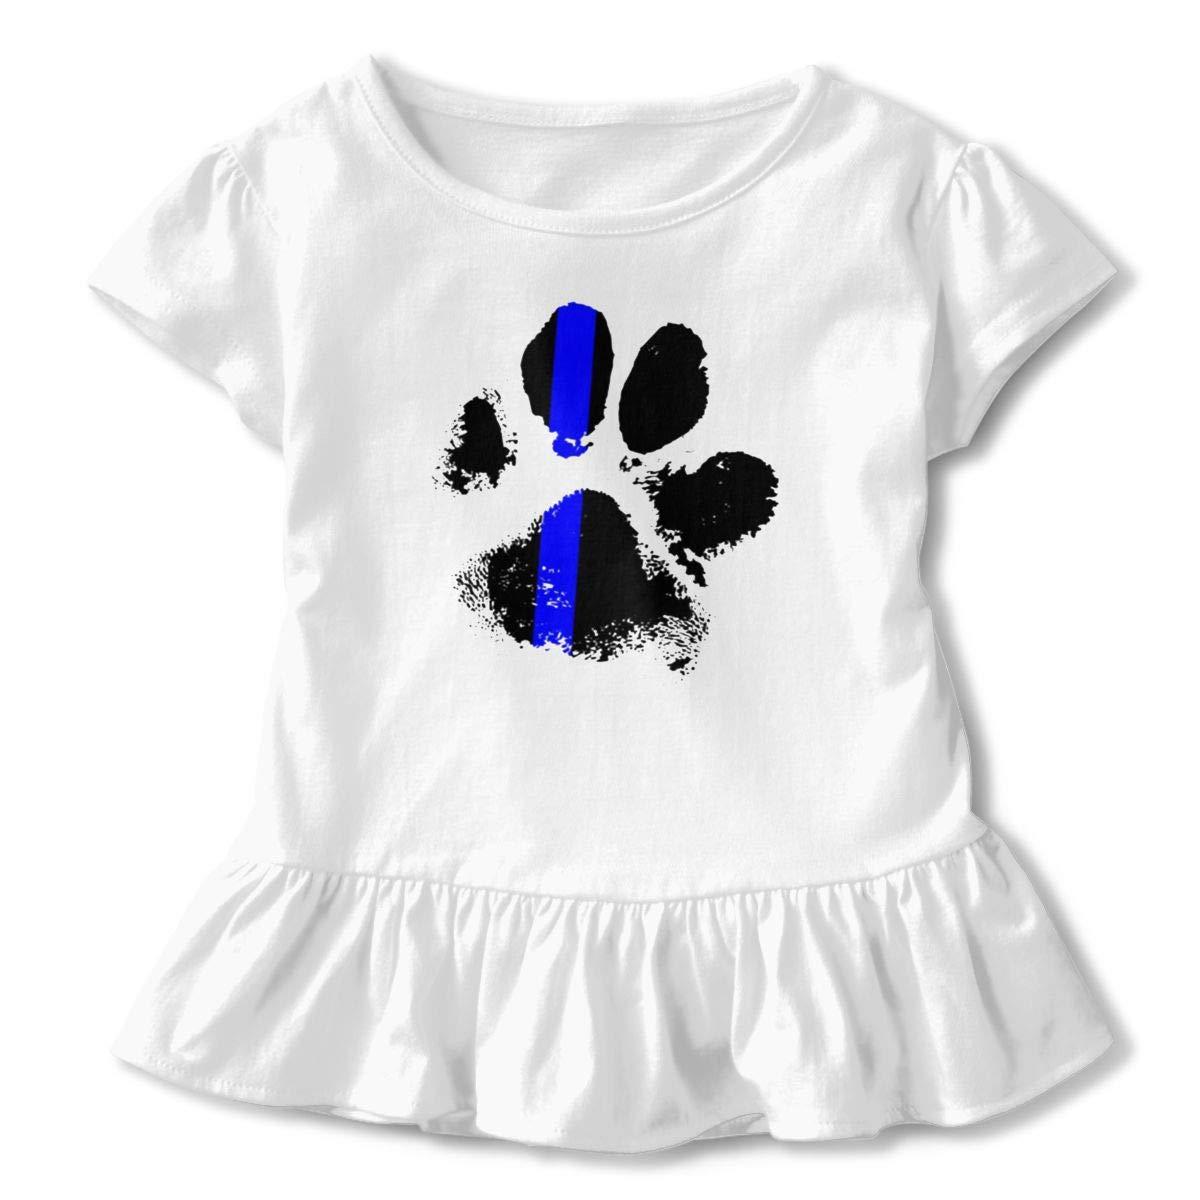 Clarissa Bertha K9 Blue Line Toddler Baby Girls Short Sleeve Ruffle T-Shirt